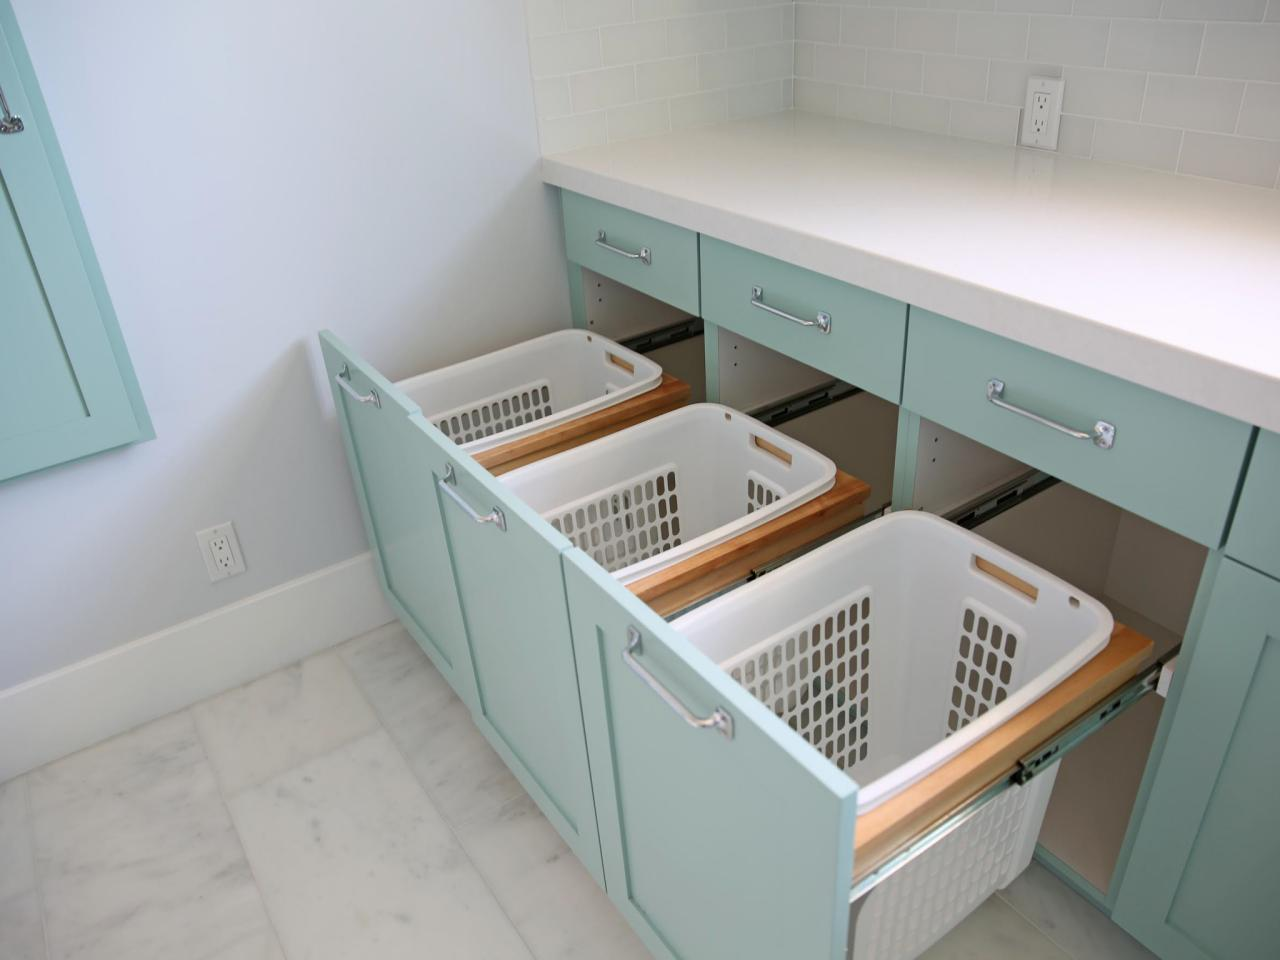 Utility room storage drawers